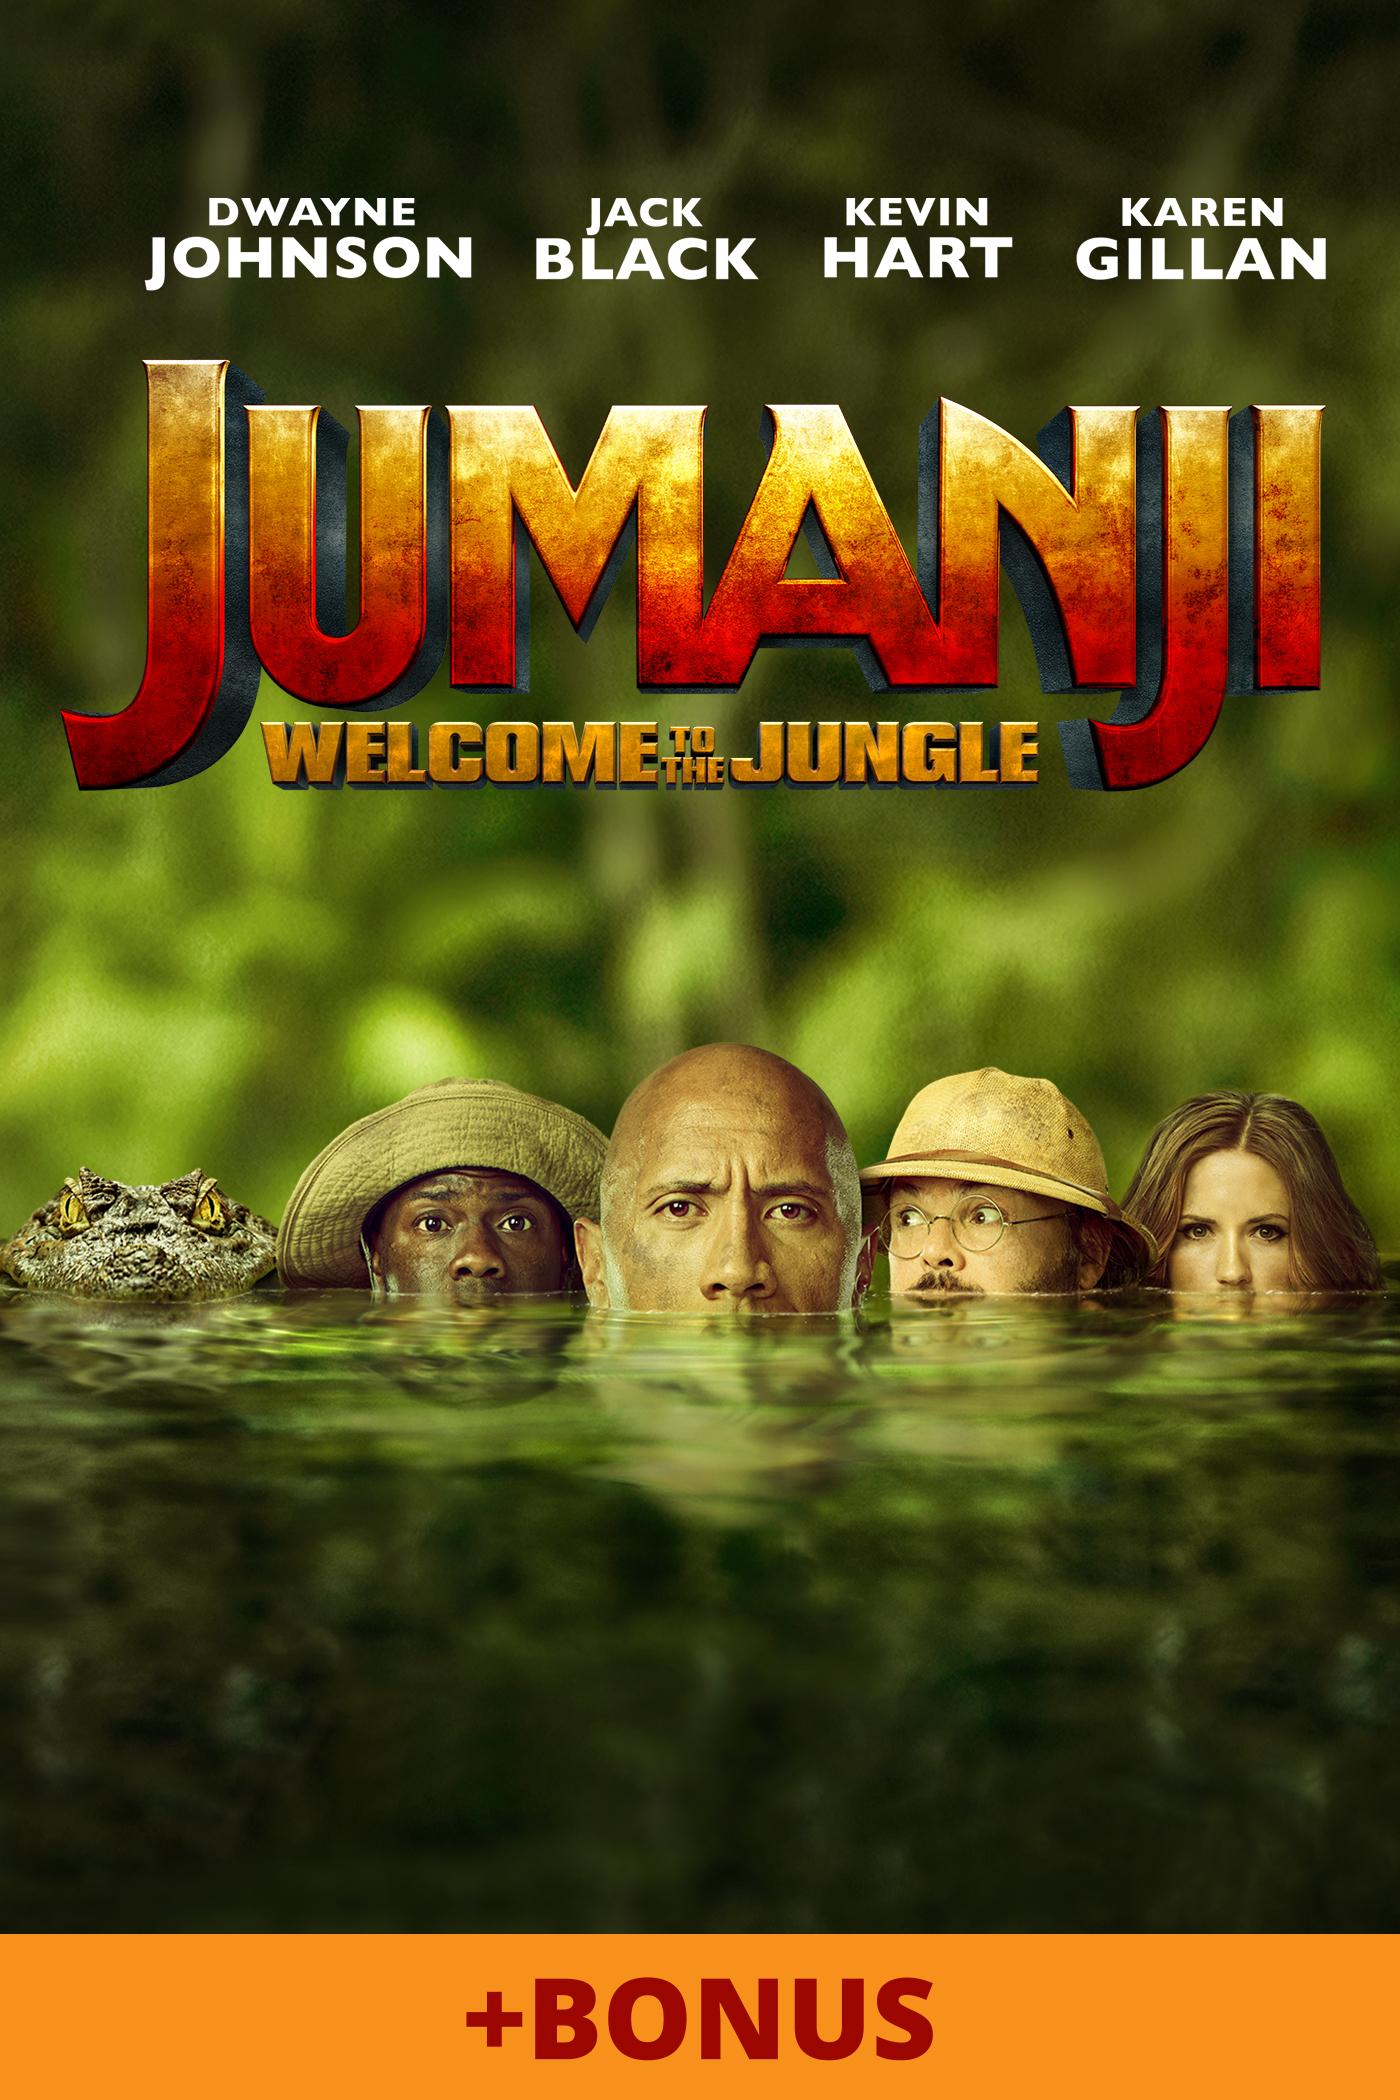 Jumanji: Welcome to the Jungle + Bonus